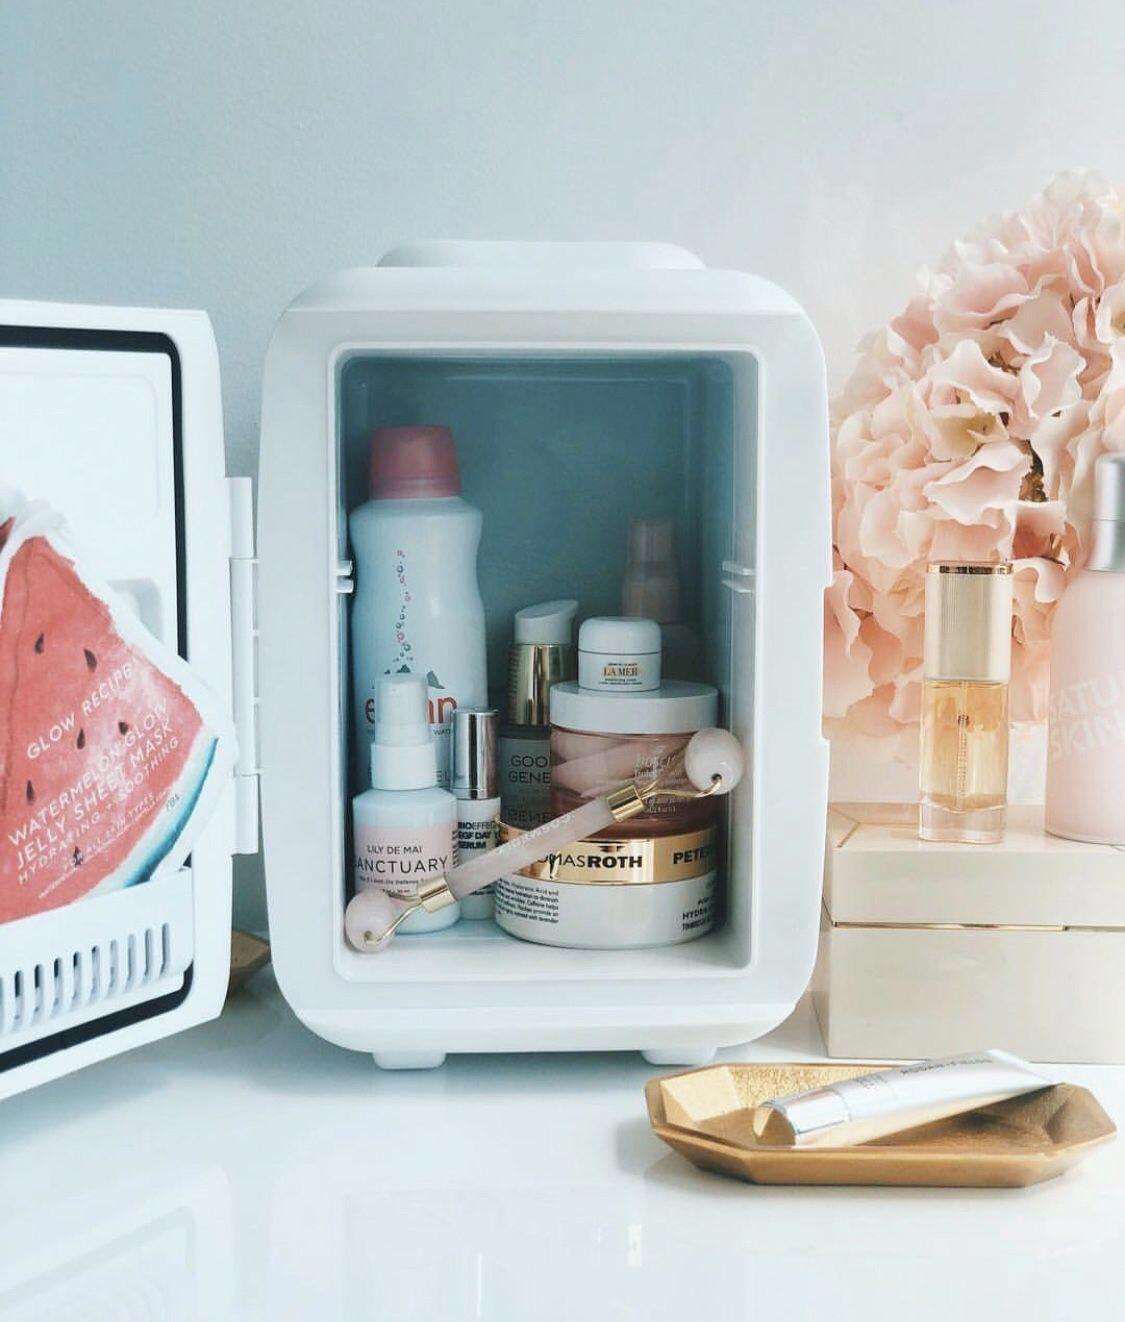 Mini skincare/makeup fridge LuxuryFragrance Skin care